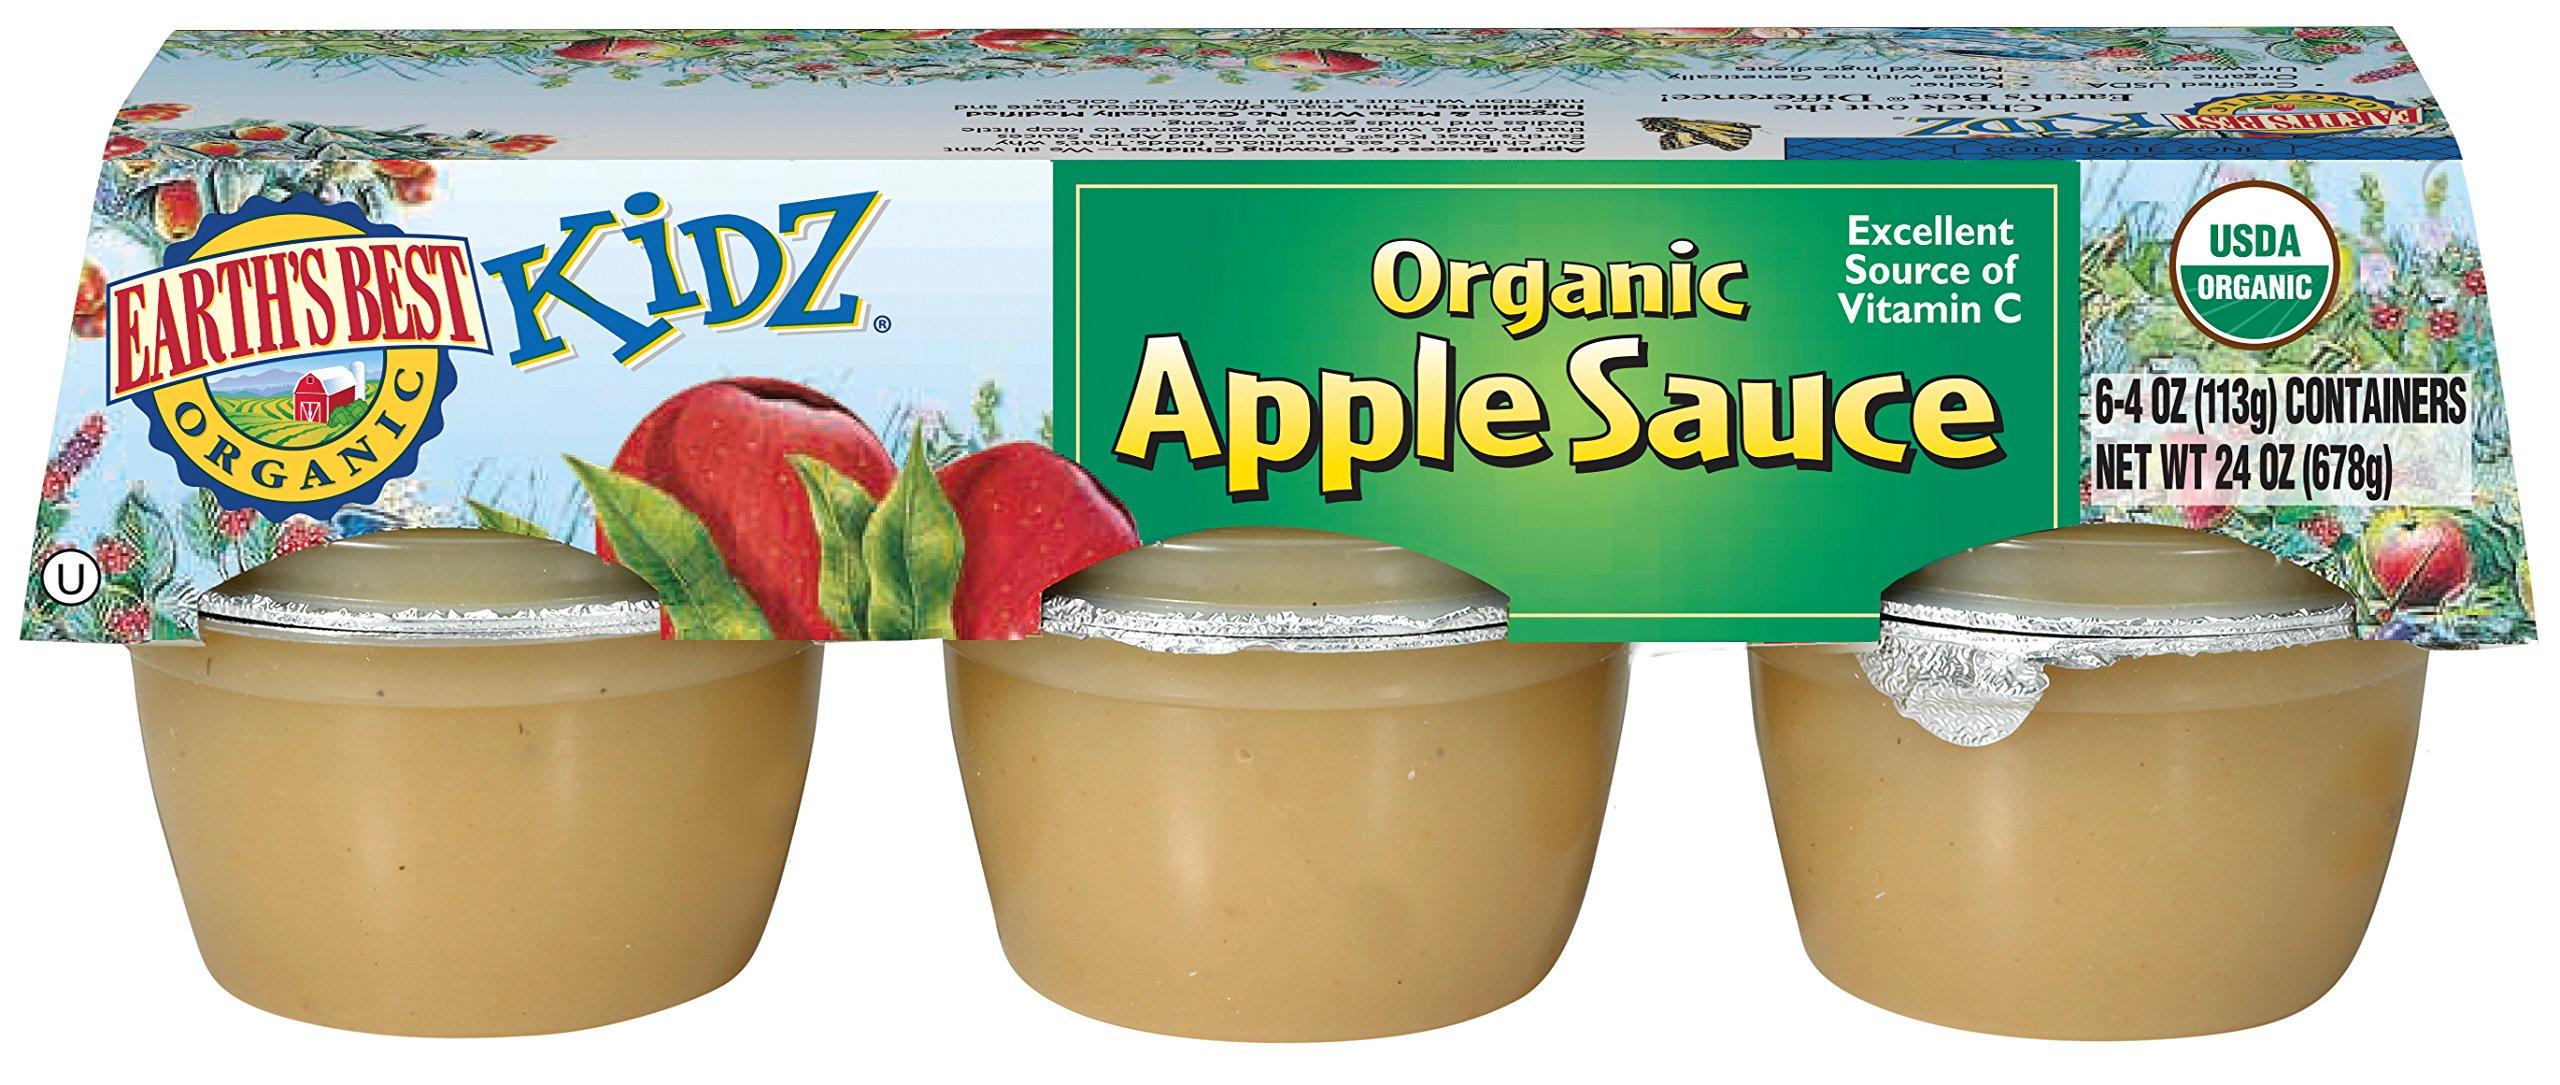 Earth's Best Organic Kidz, Apple Sauce, 6 Count, 4 Ounce